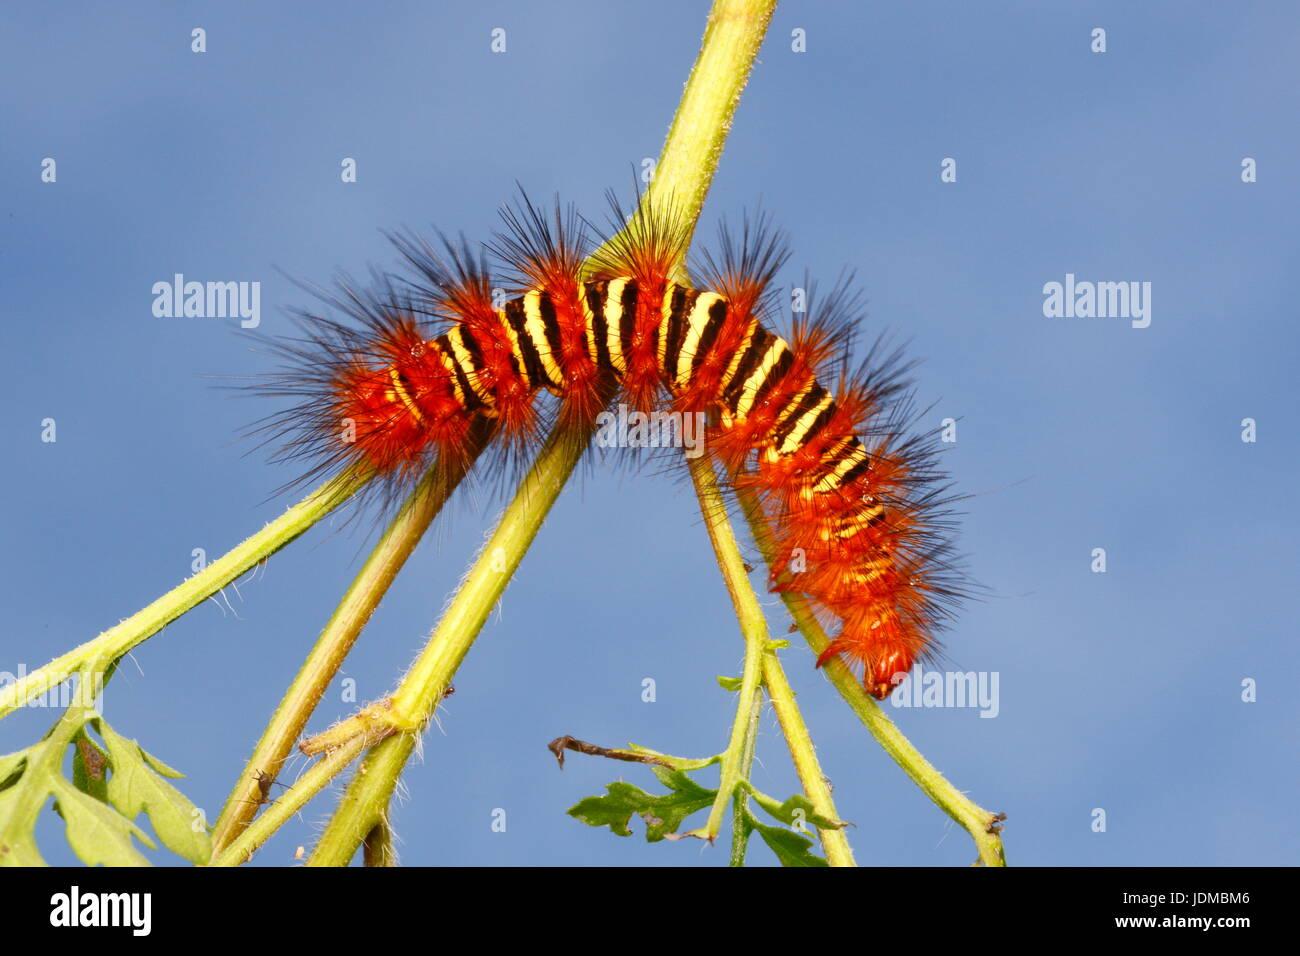 An echo moth caterpillar, Seirarctia echo, crawls on a plant stem. - Stock Image